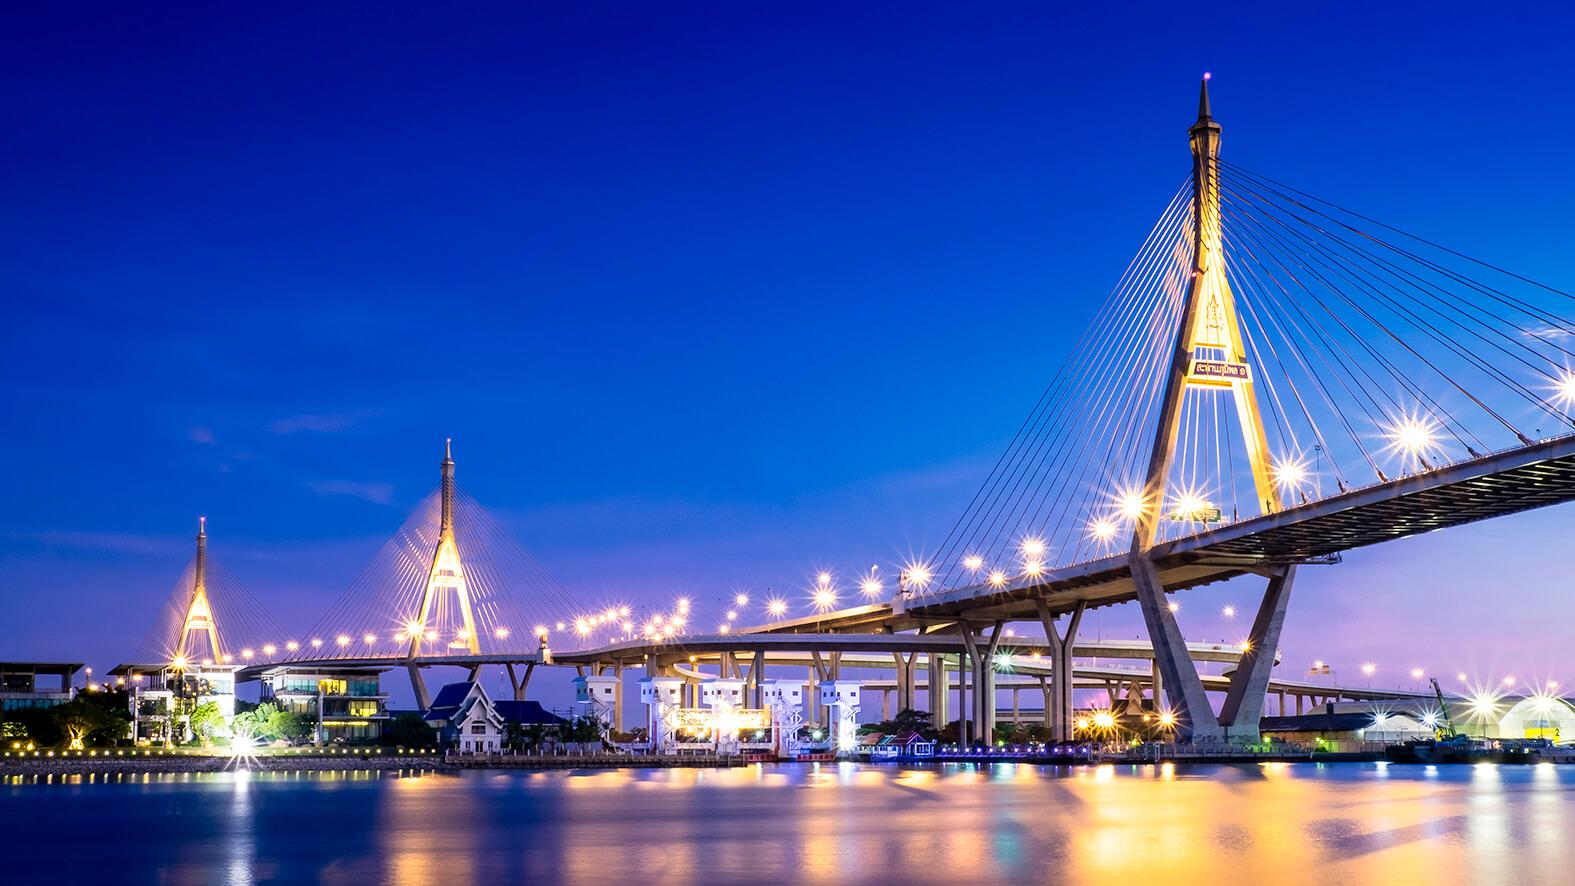 Huge Bridge over River in Bangkok, Thailand